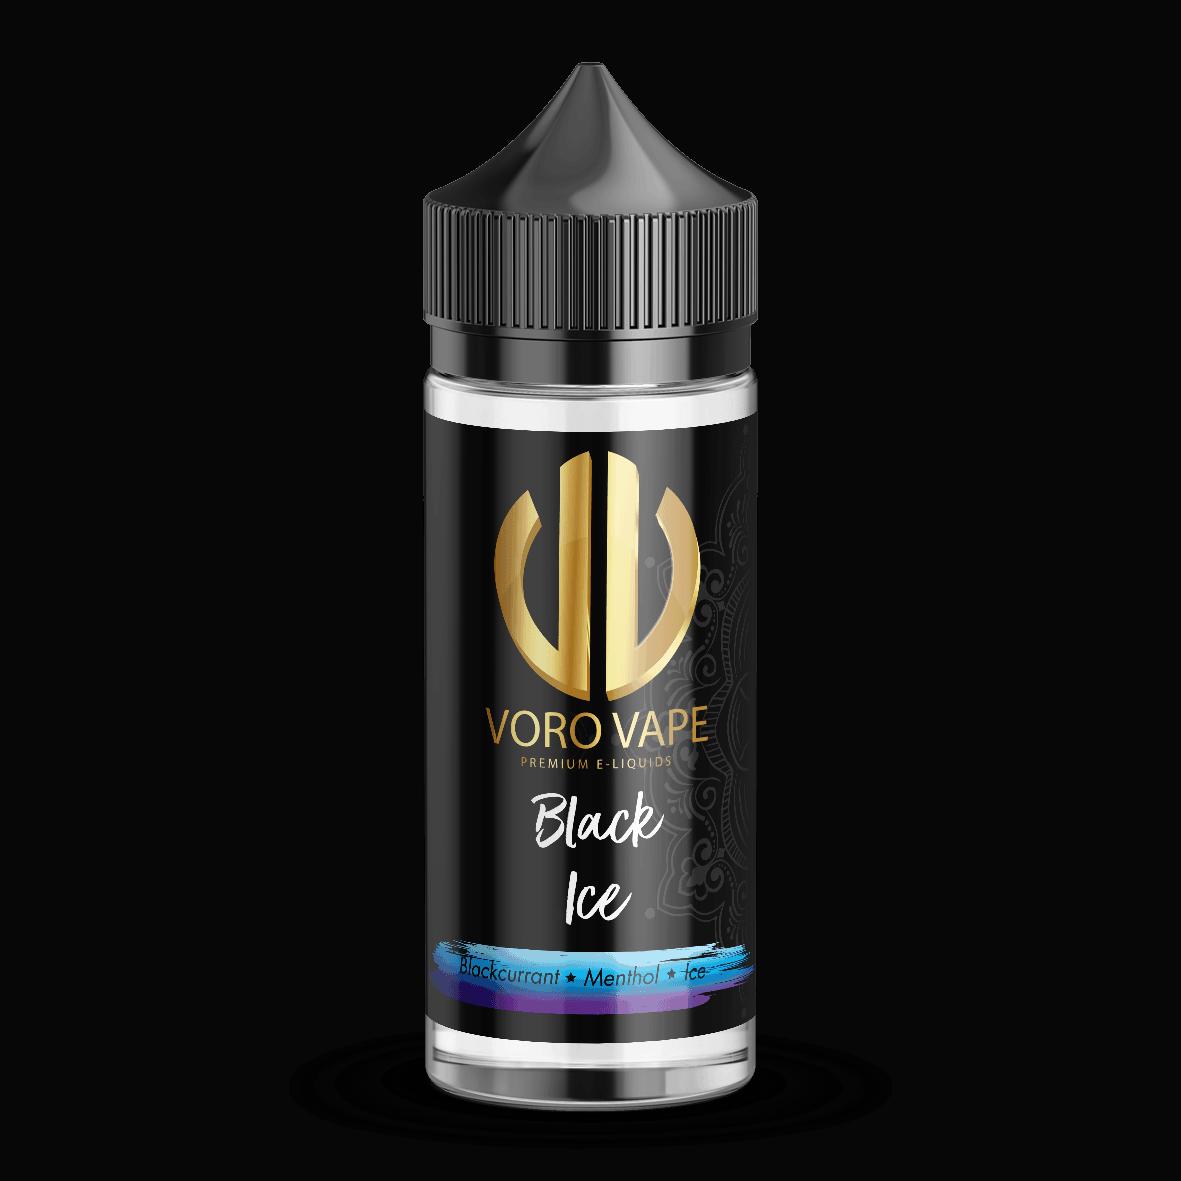 Black Ice E-Liquid Shortfill by Voro Vape